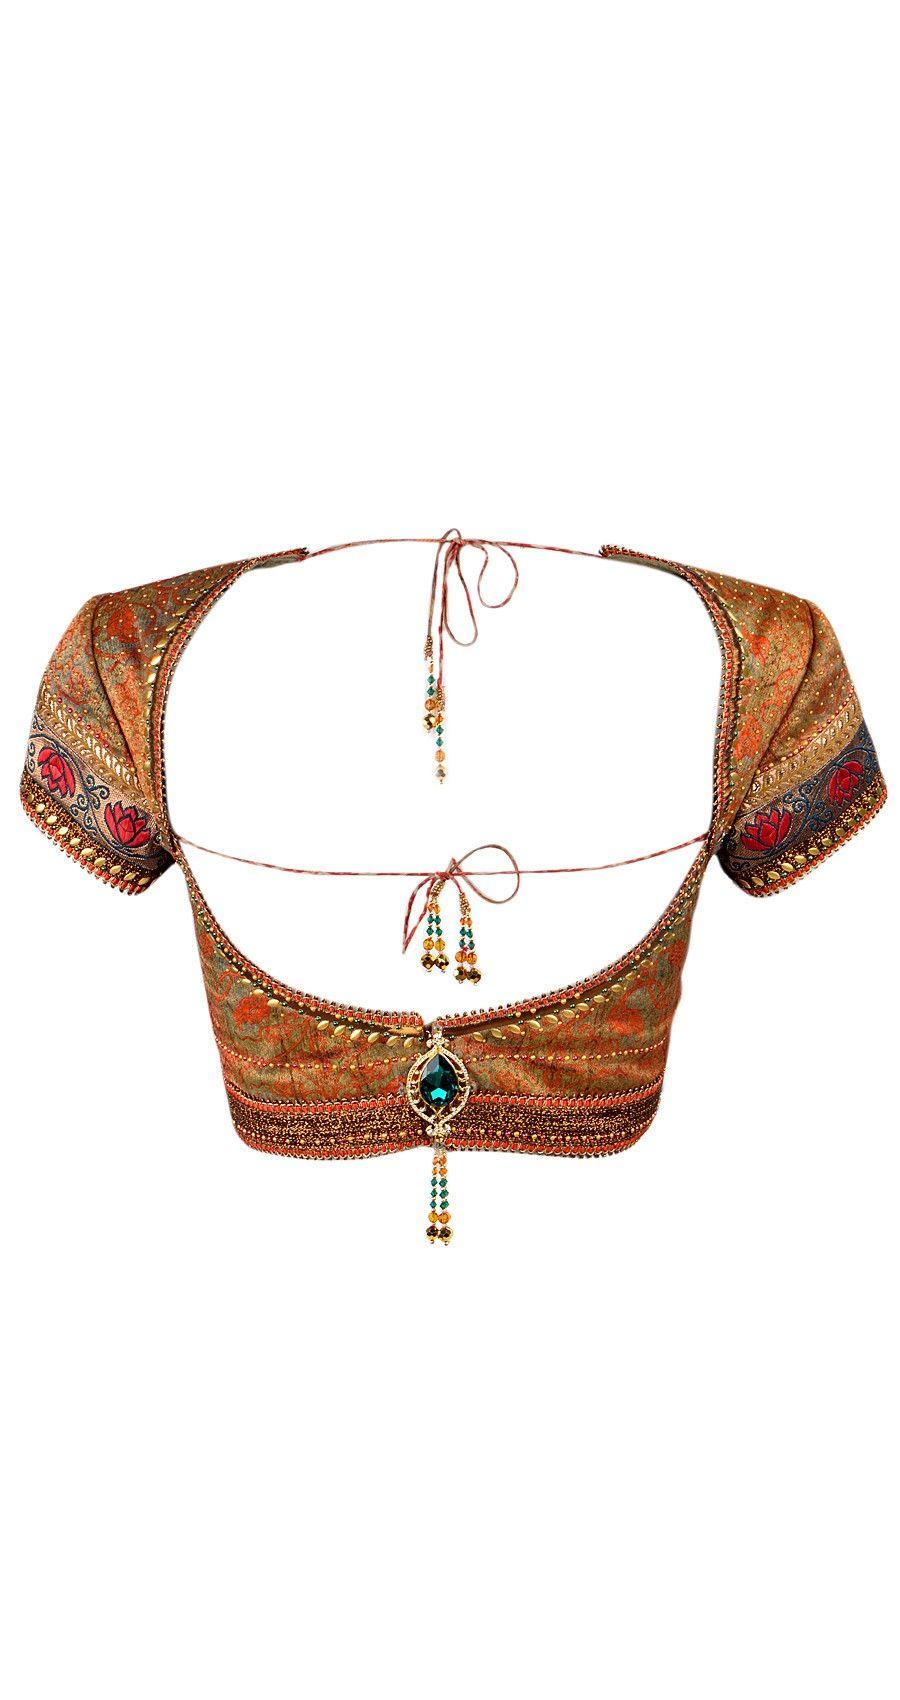 Gorgeous Tarun Tahiliani Open Back Choli Blouse  visit for similar designer blouse at: https://www.etsy.com/shop/JiyaGotaZariLace?section_id=16402837&ref=shopsection_leftnav_2